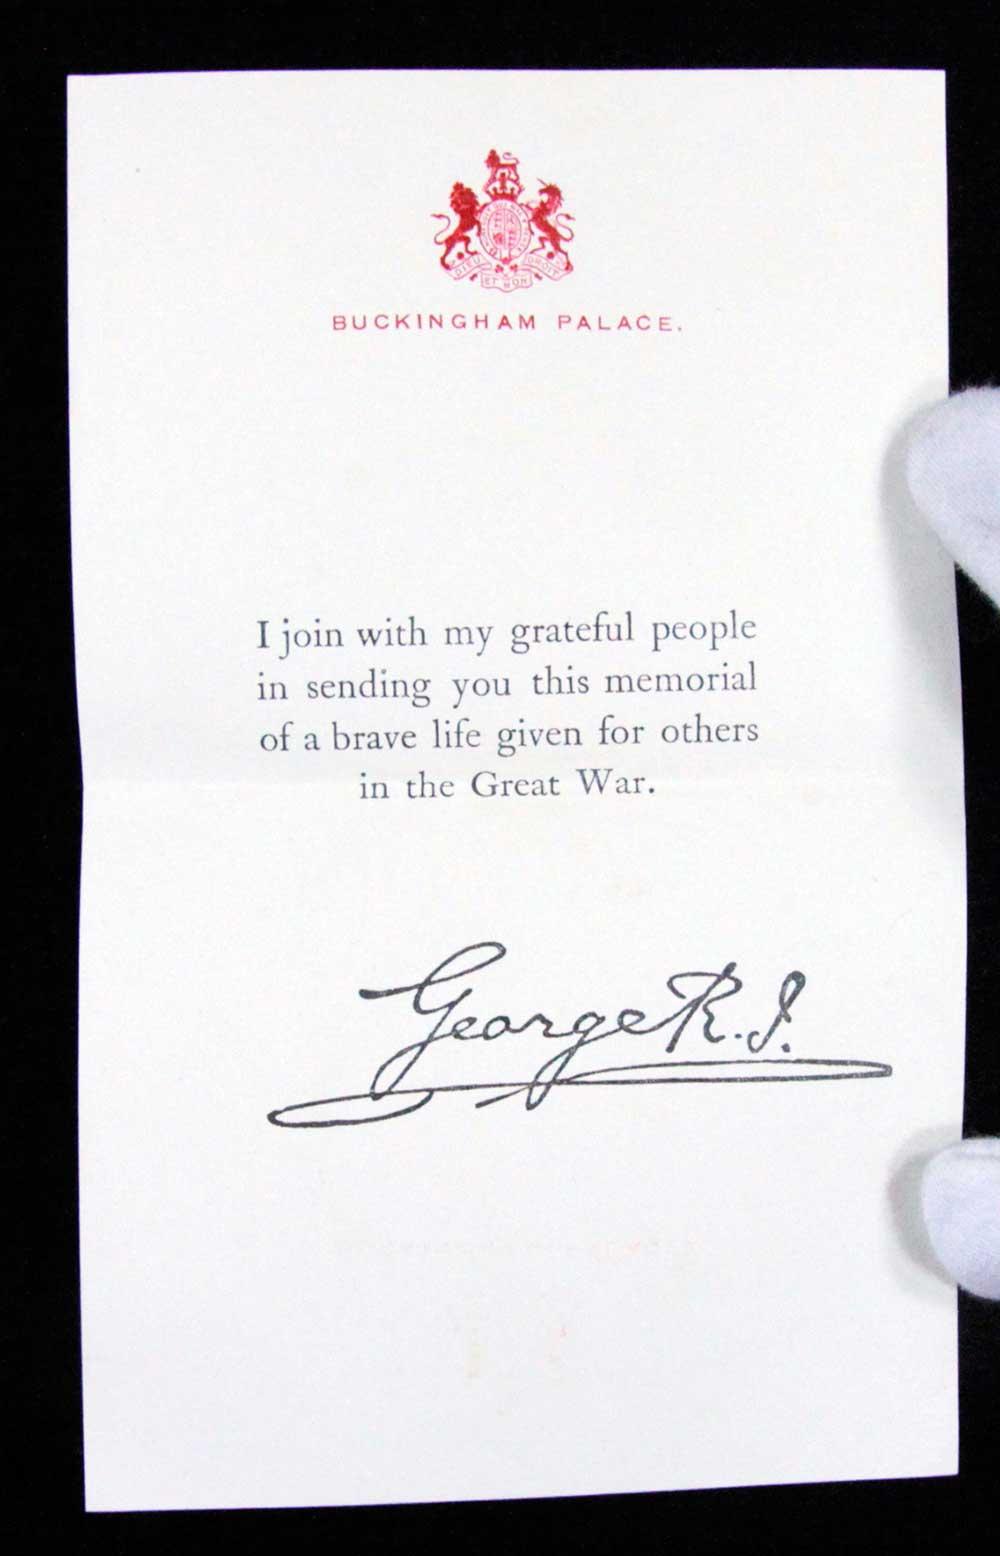 King's letter accompanying Memorial plaque, Ernest Murphy